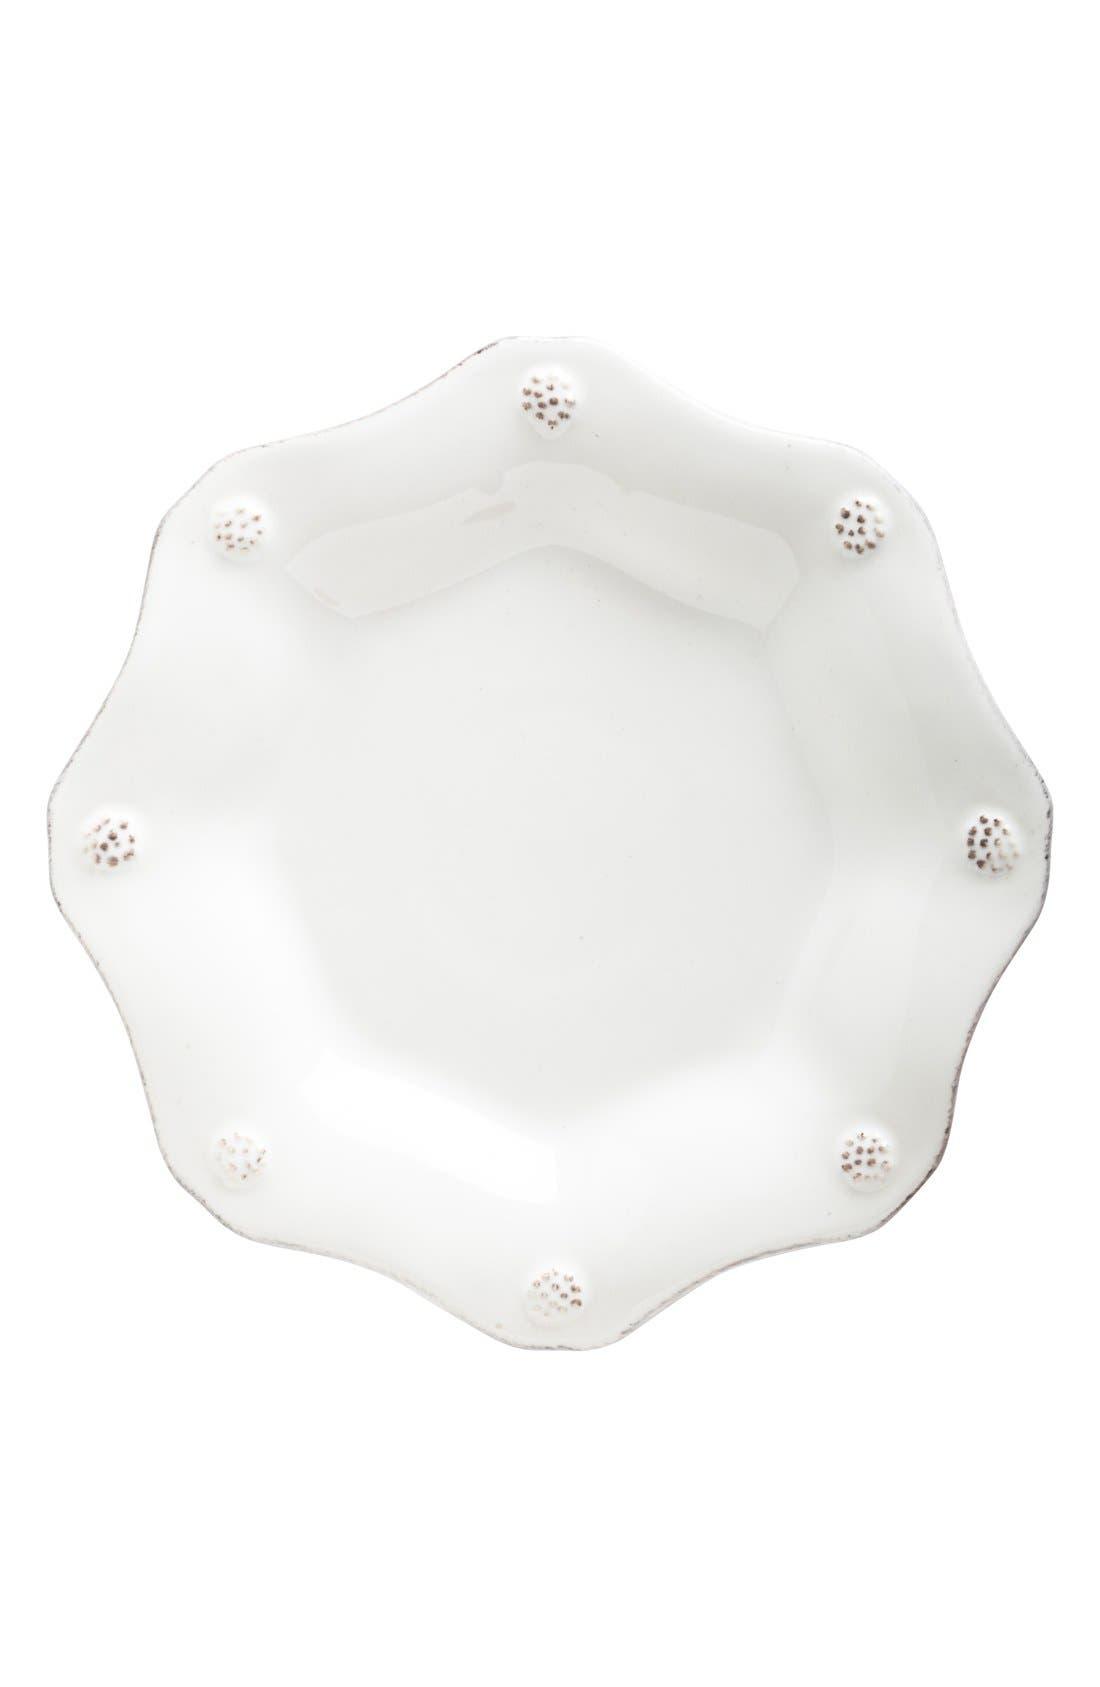 Juliska'Berry and Thread' Scalloped Tea Plate